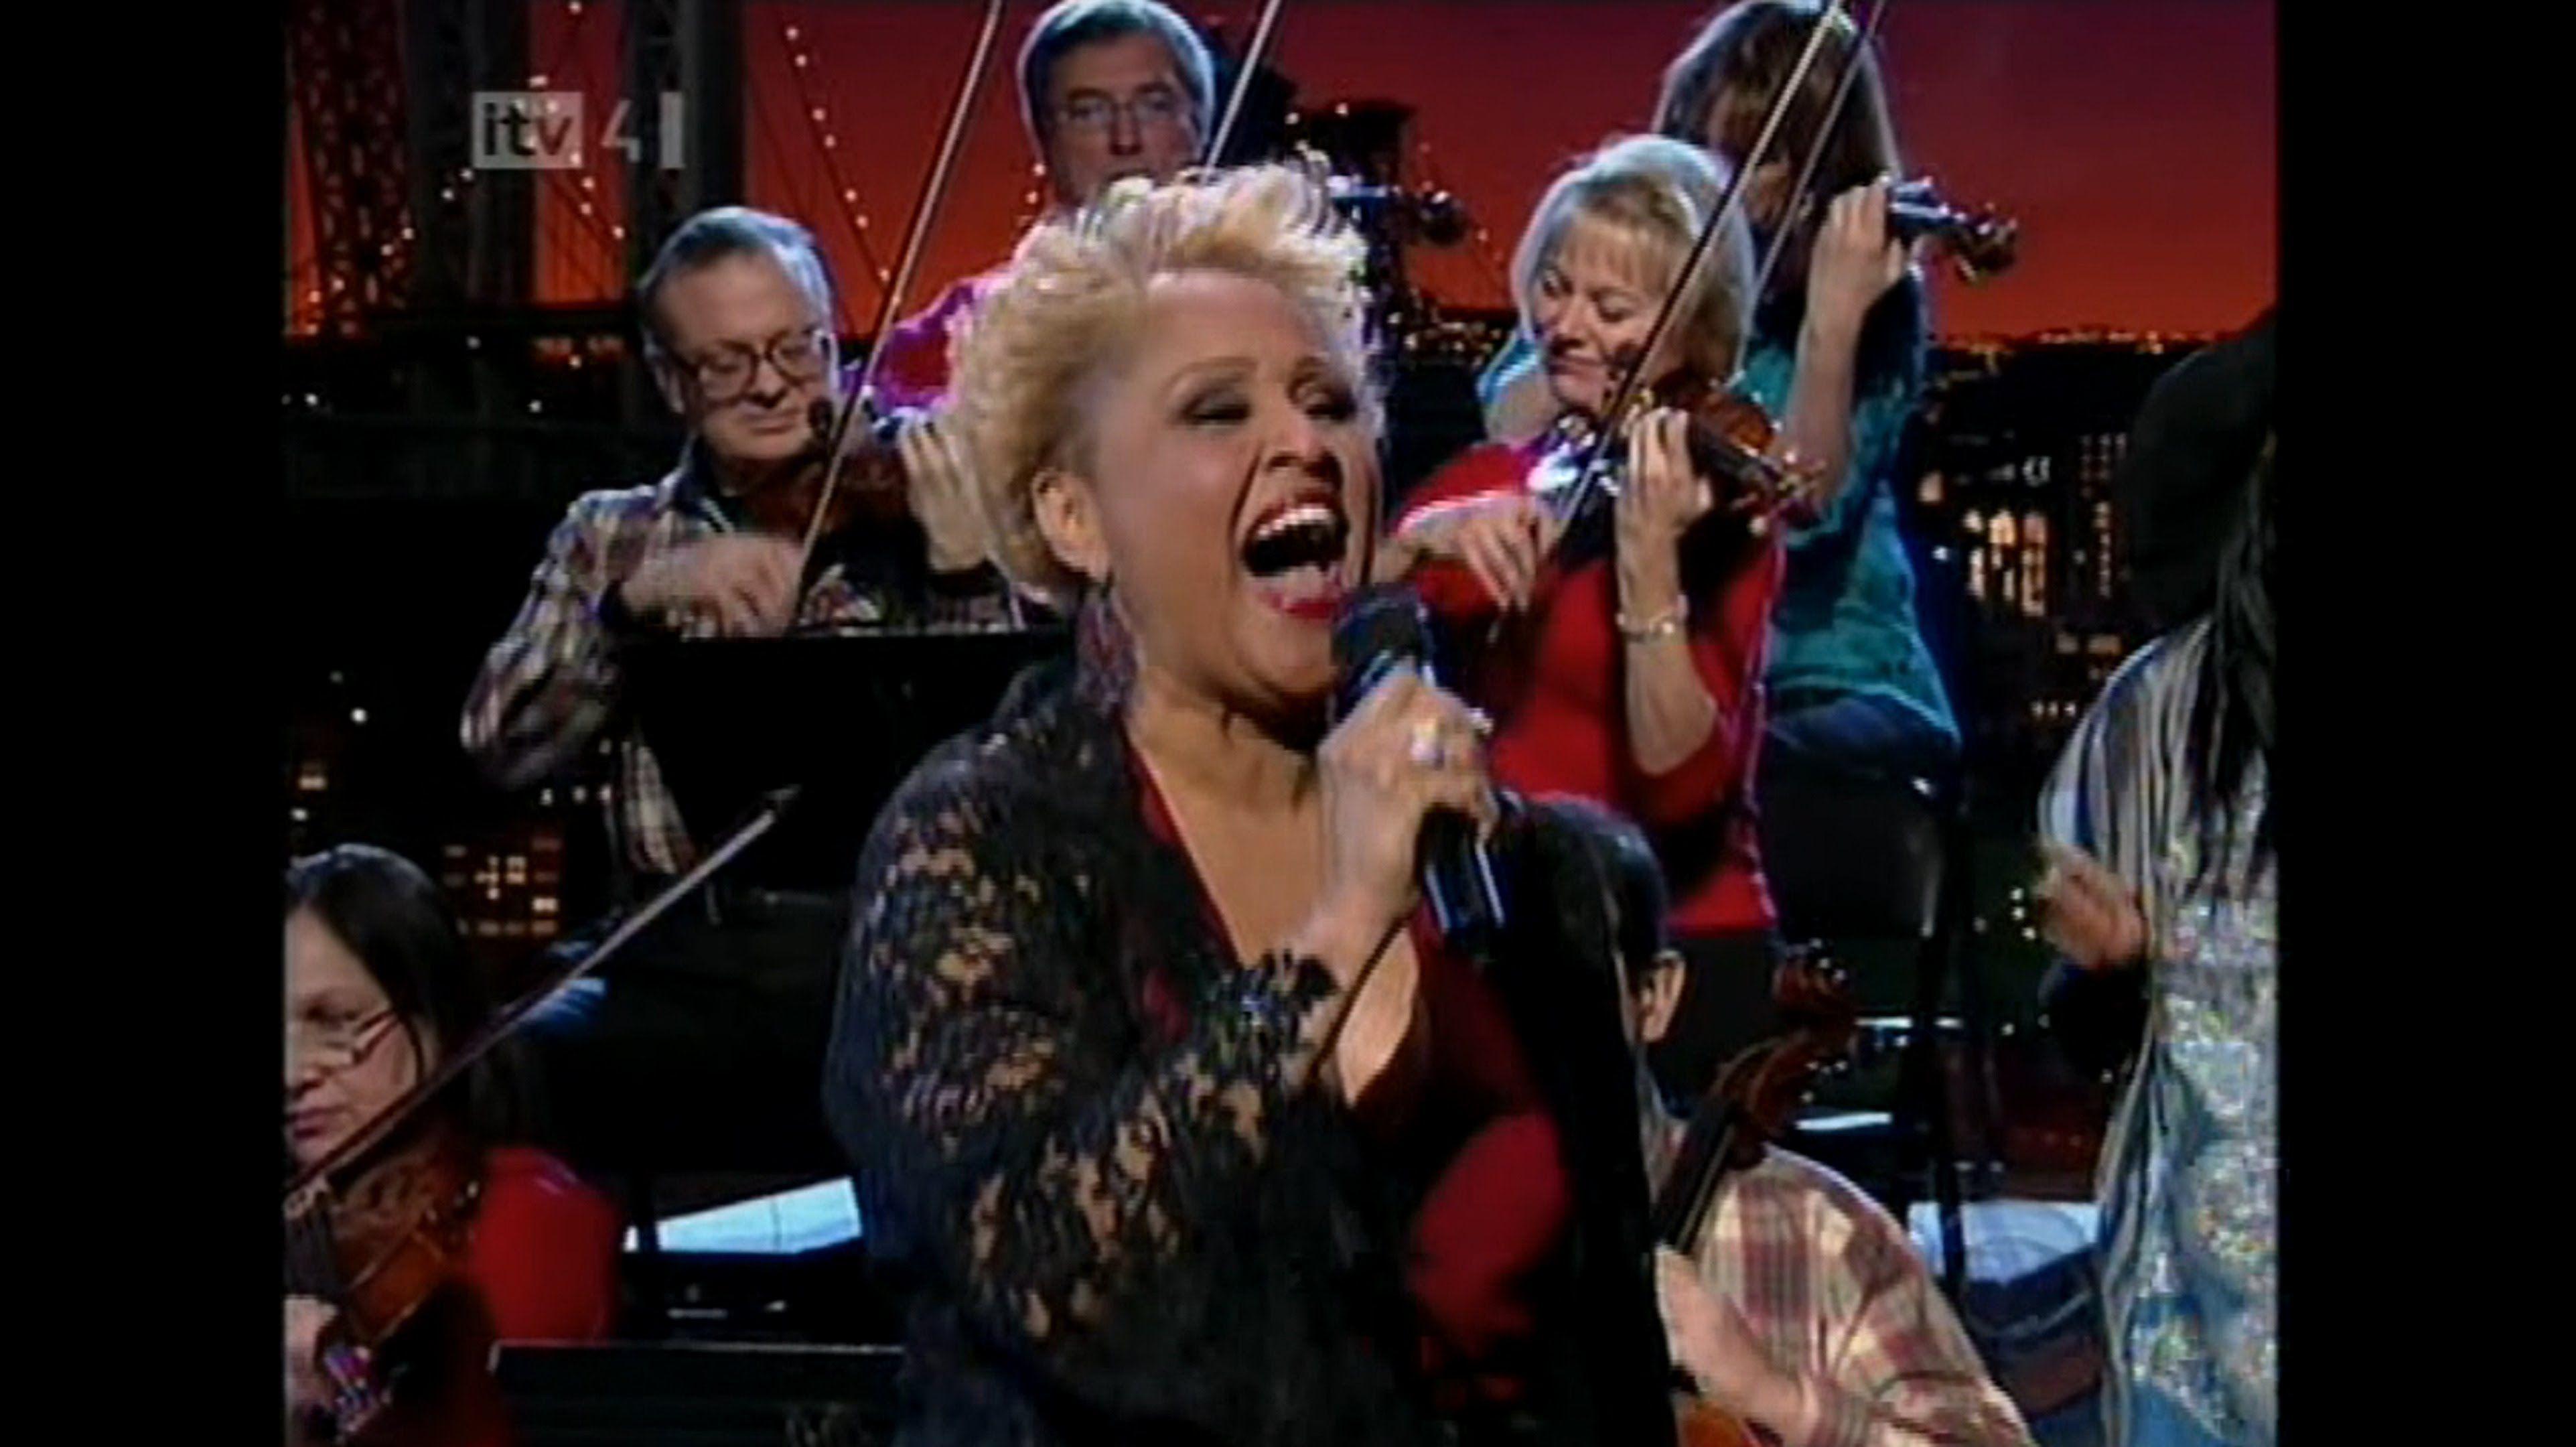 darlene love christmas baby please come home 2005 youtube - Darlene Love Christmas Baby Please Come Home